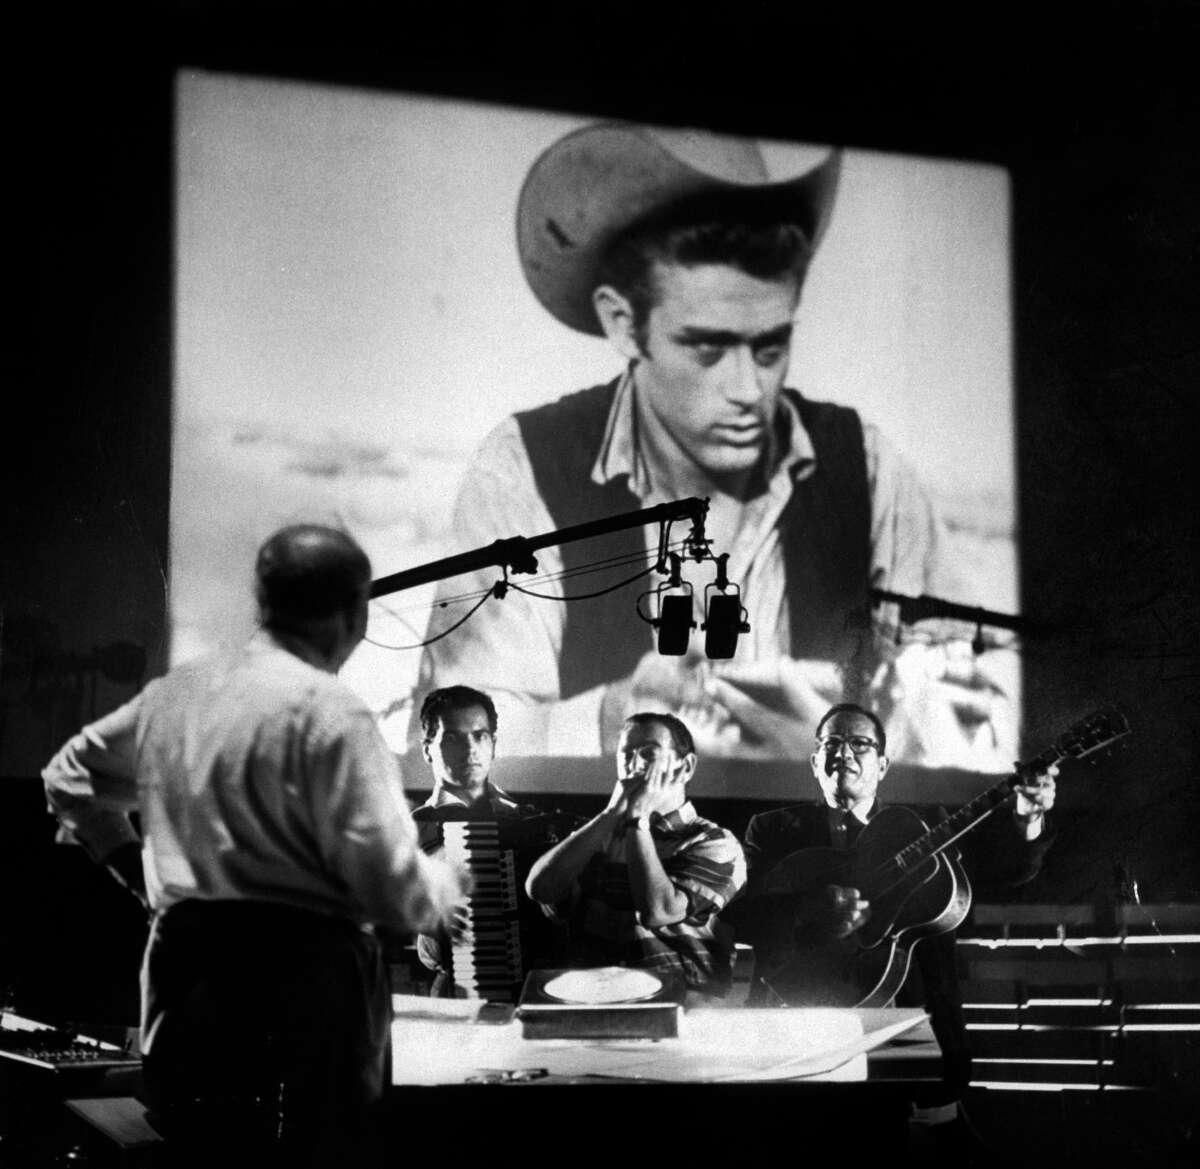 Photos of the 1956 film